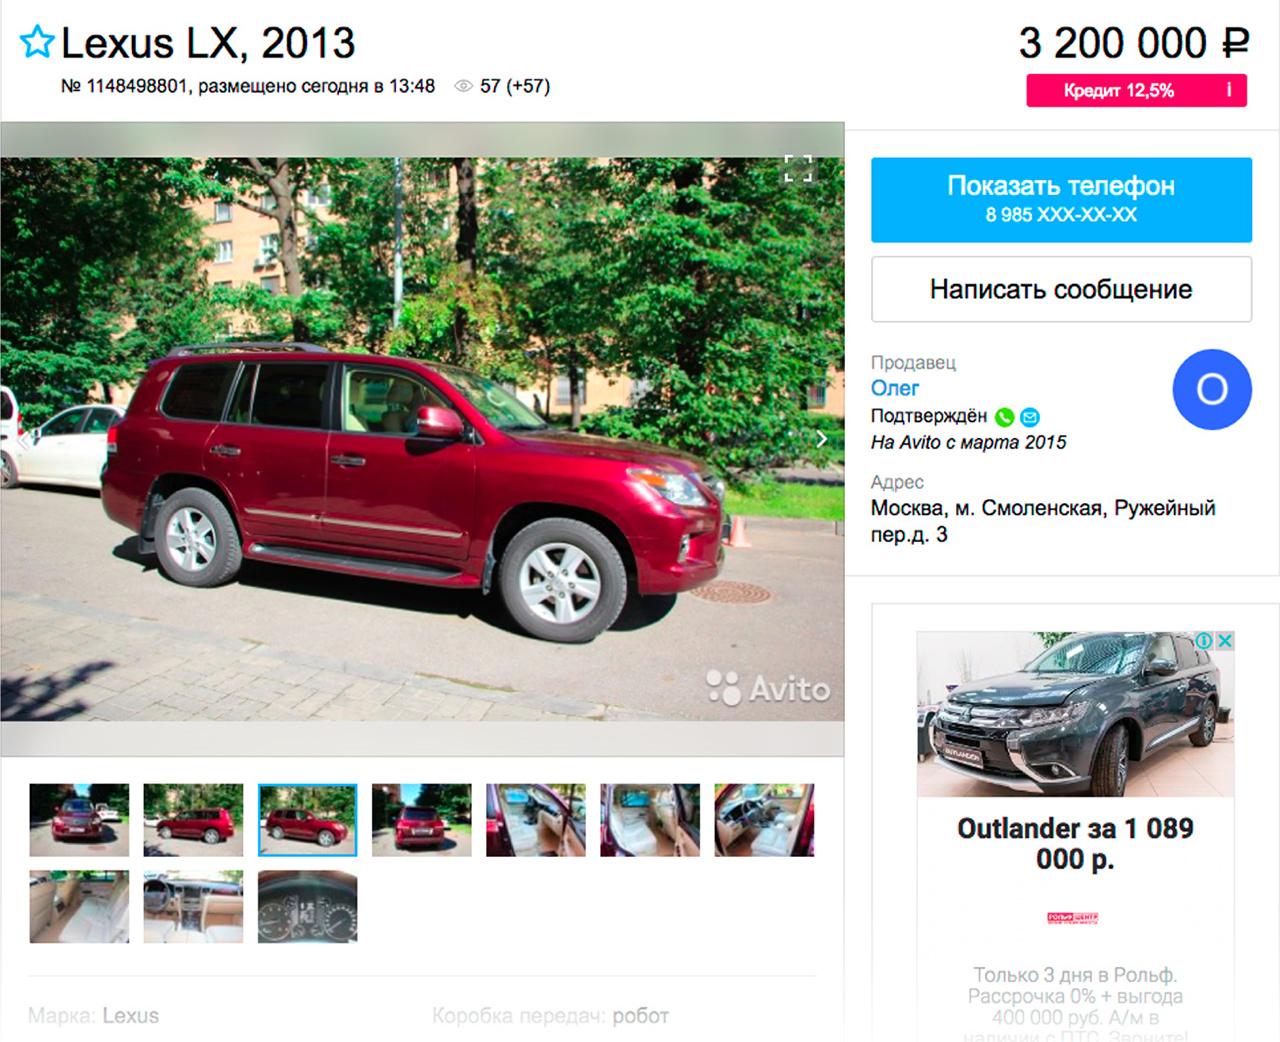 9eae292ae2ca5 Как продать авто через сайт Авито — журнал За рулем